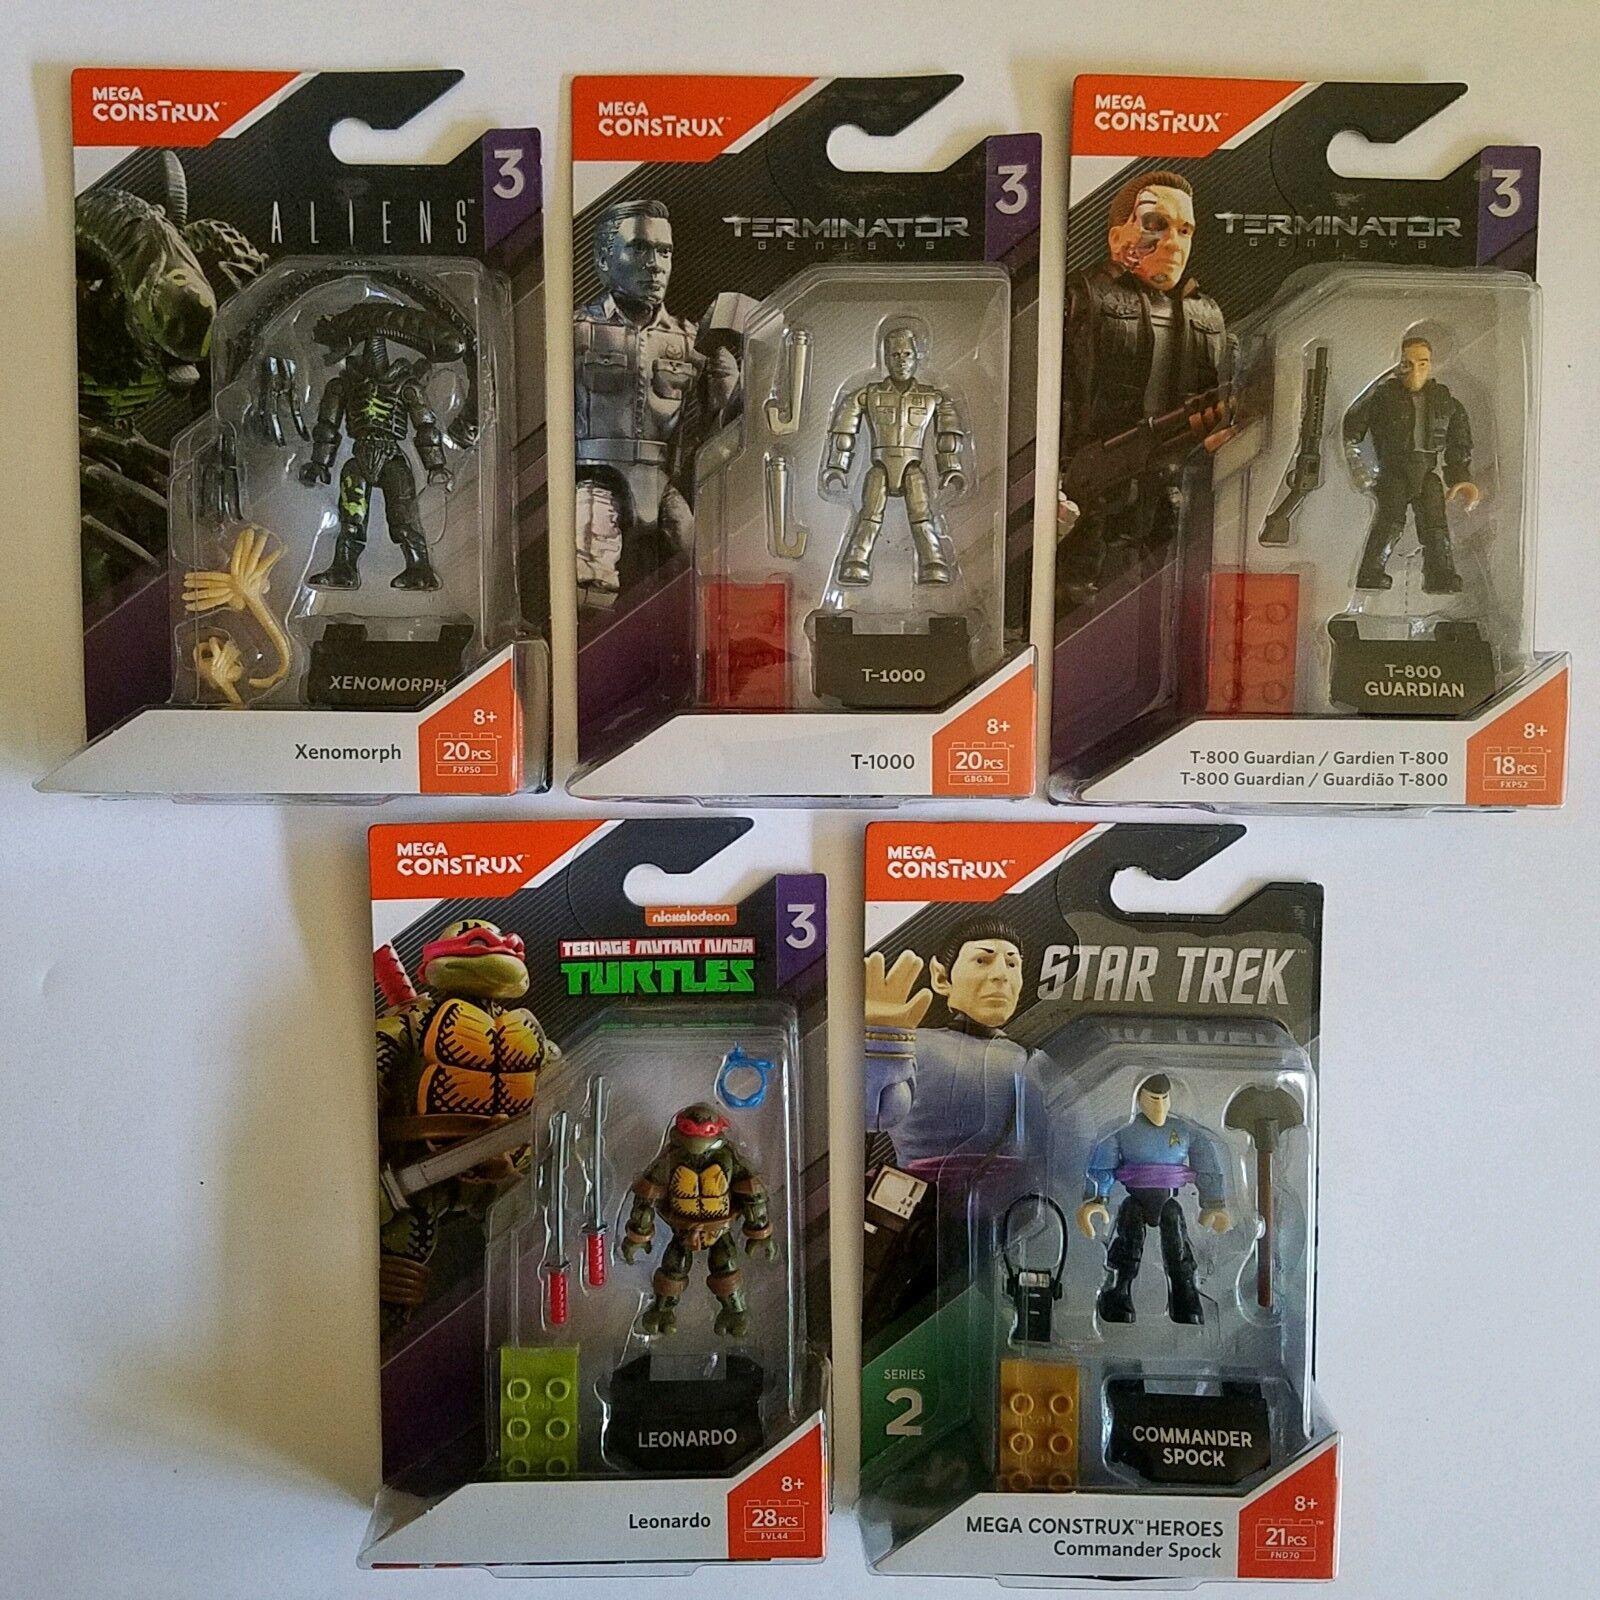 Mega - construx menge 5 mini - action - figuren aliens, star trek, terminator, tmnt